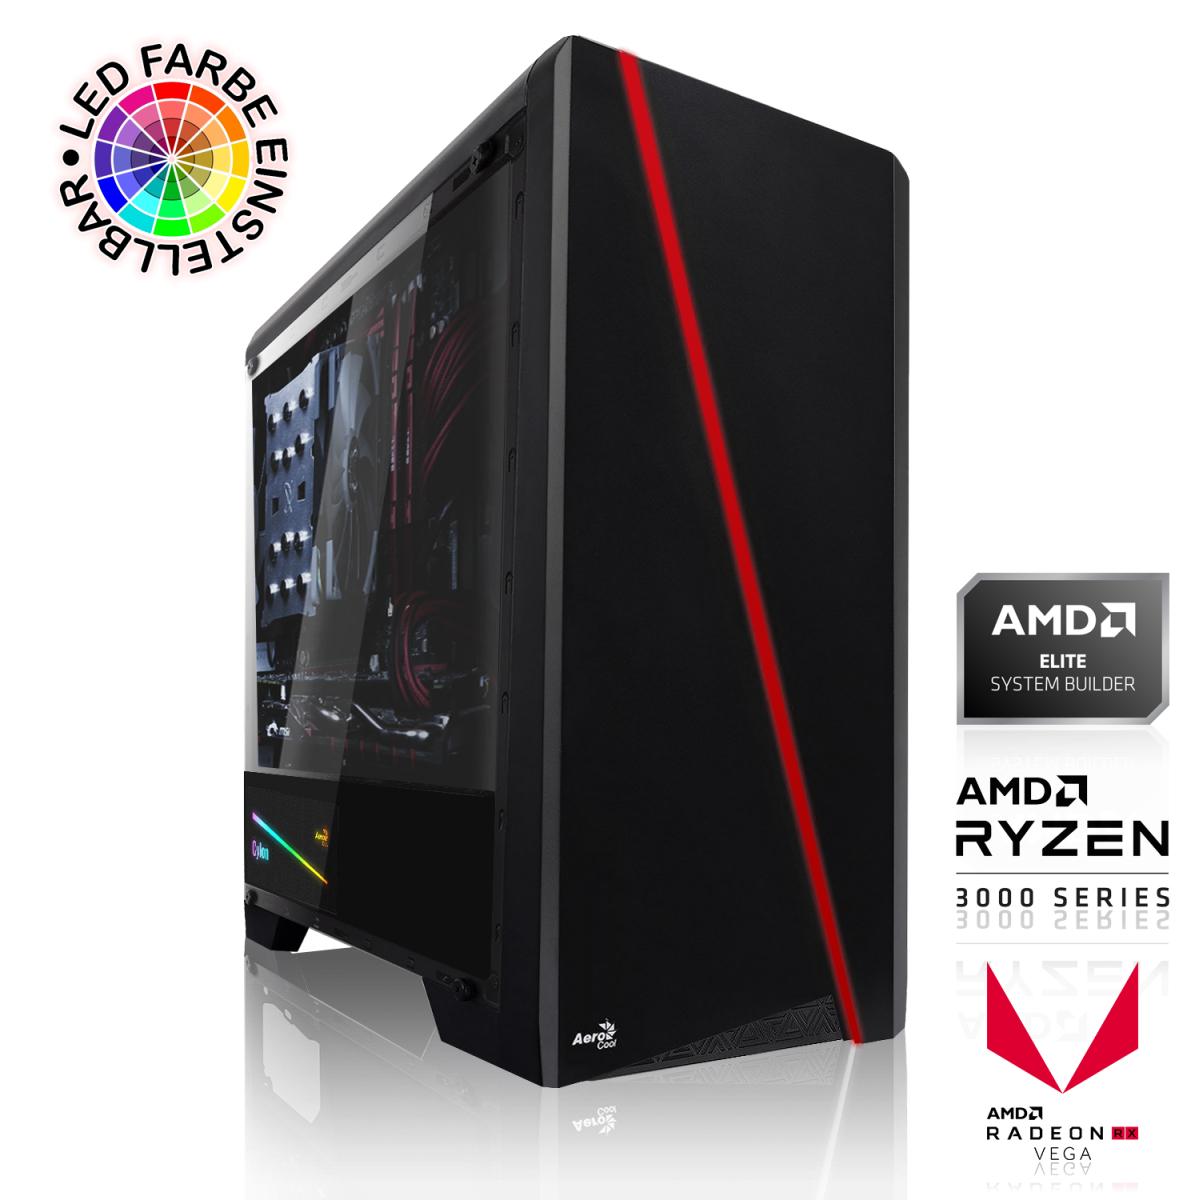 PC de Bureau - AMD Ryzen 5 3600 6x3.60GHz, 16 Go DDR4,480 Go SSD, RX Vega 56